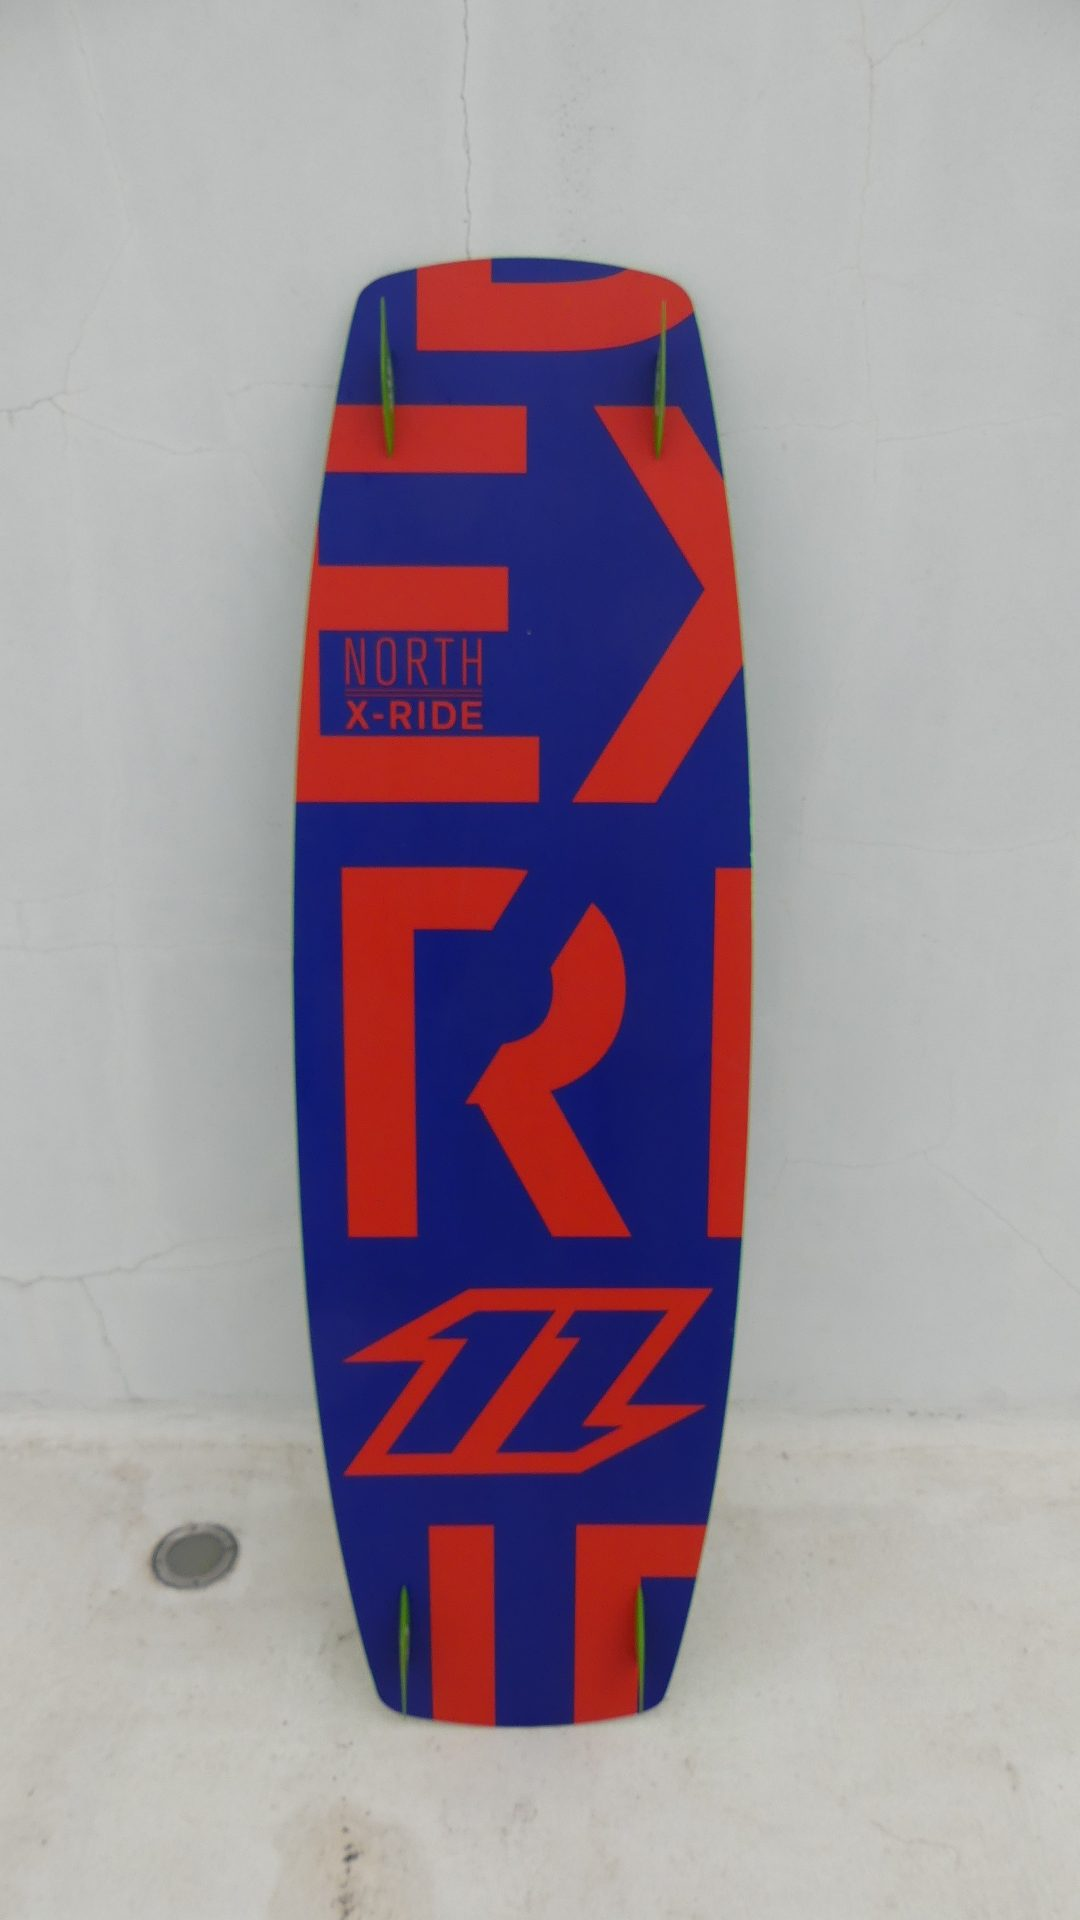 2014NKBX-RIDE141usd-usr